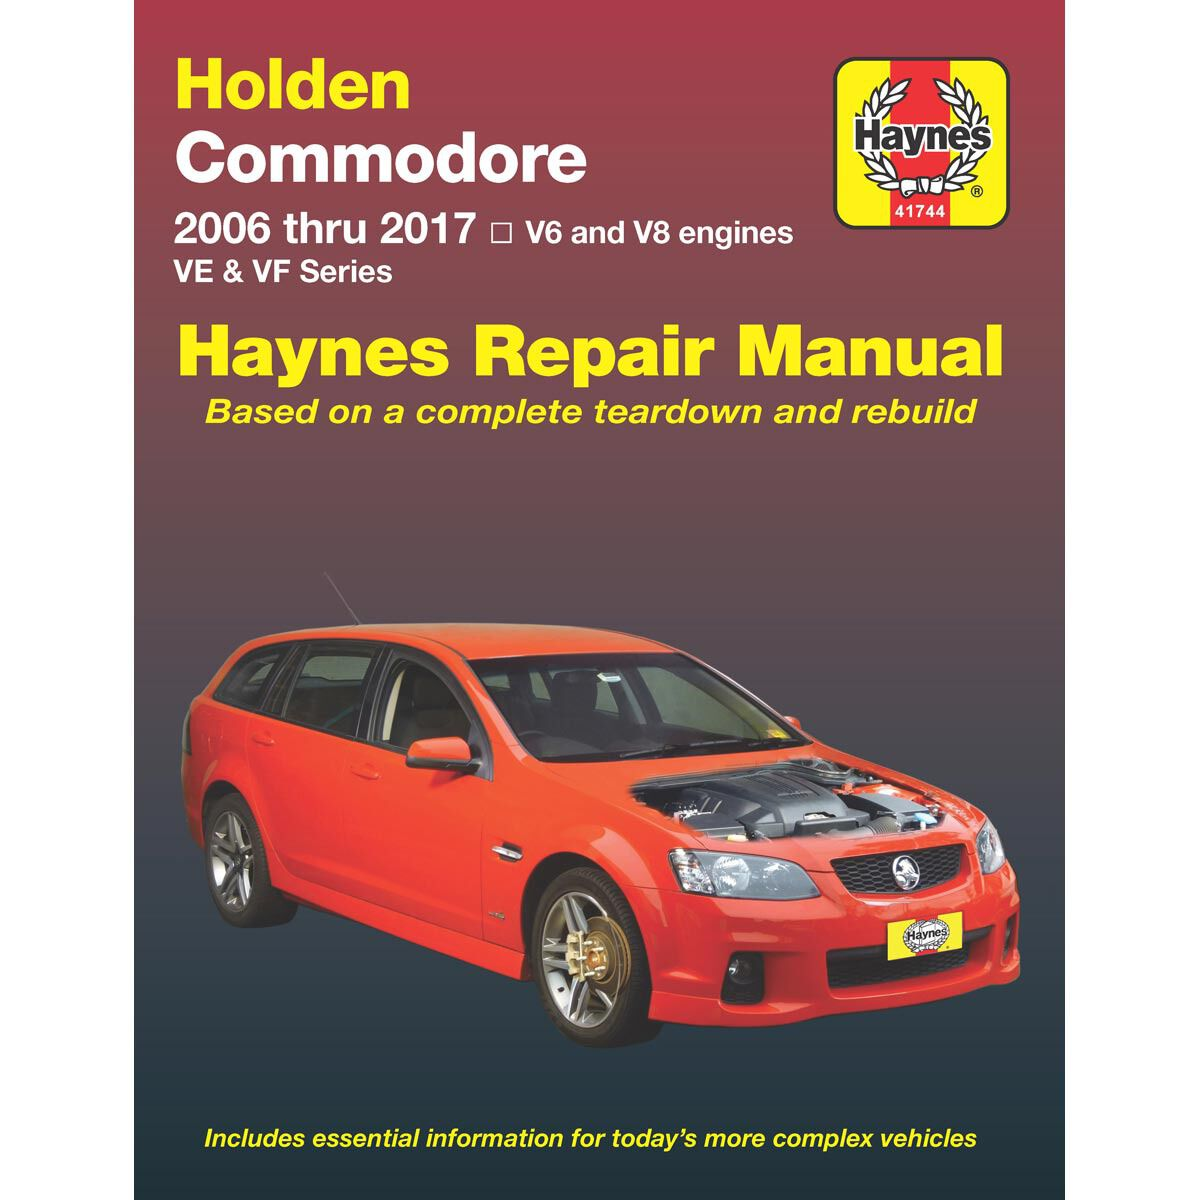 ... Array - haynes car manual for holden commodore ve vf 2006 2017 41744 rh  supercheapauto co